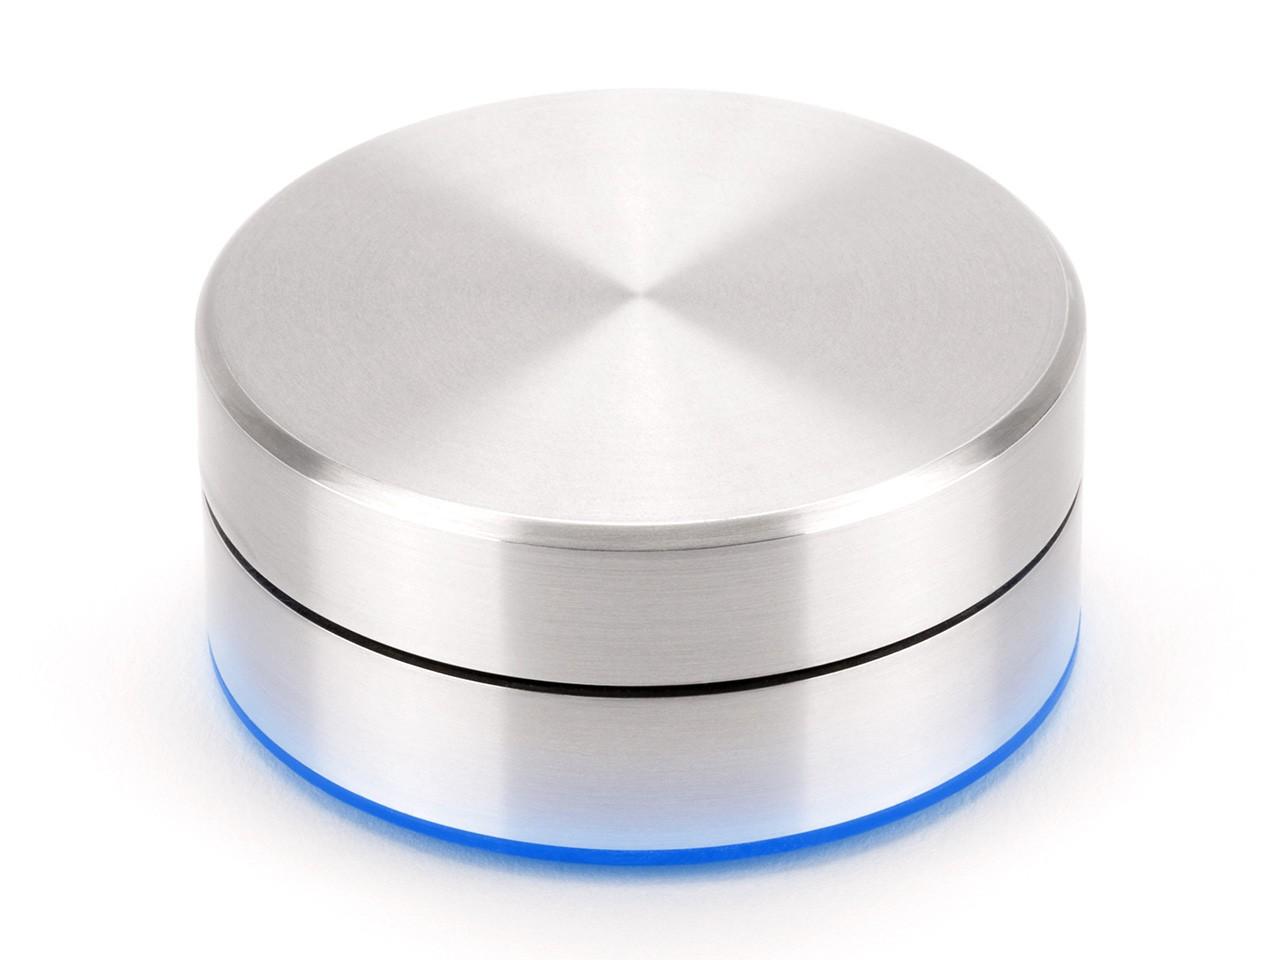 PowerMate Multi-Media Control Knob with Bluetooth Connectivity